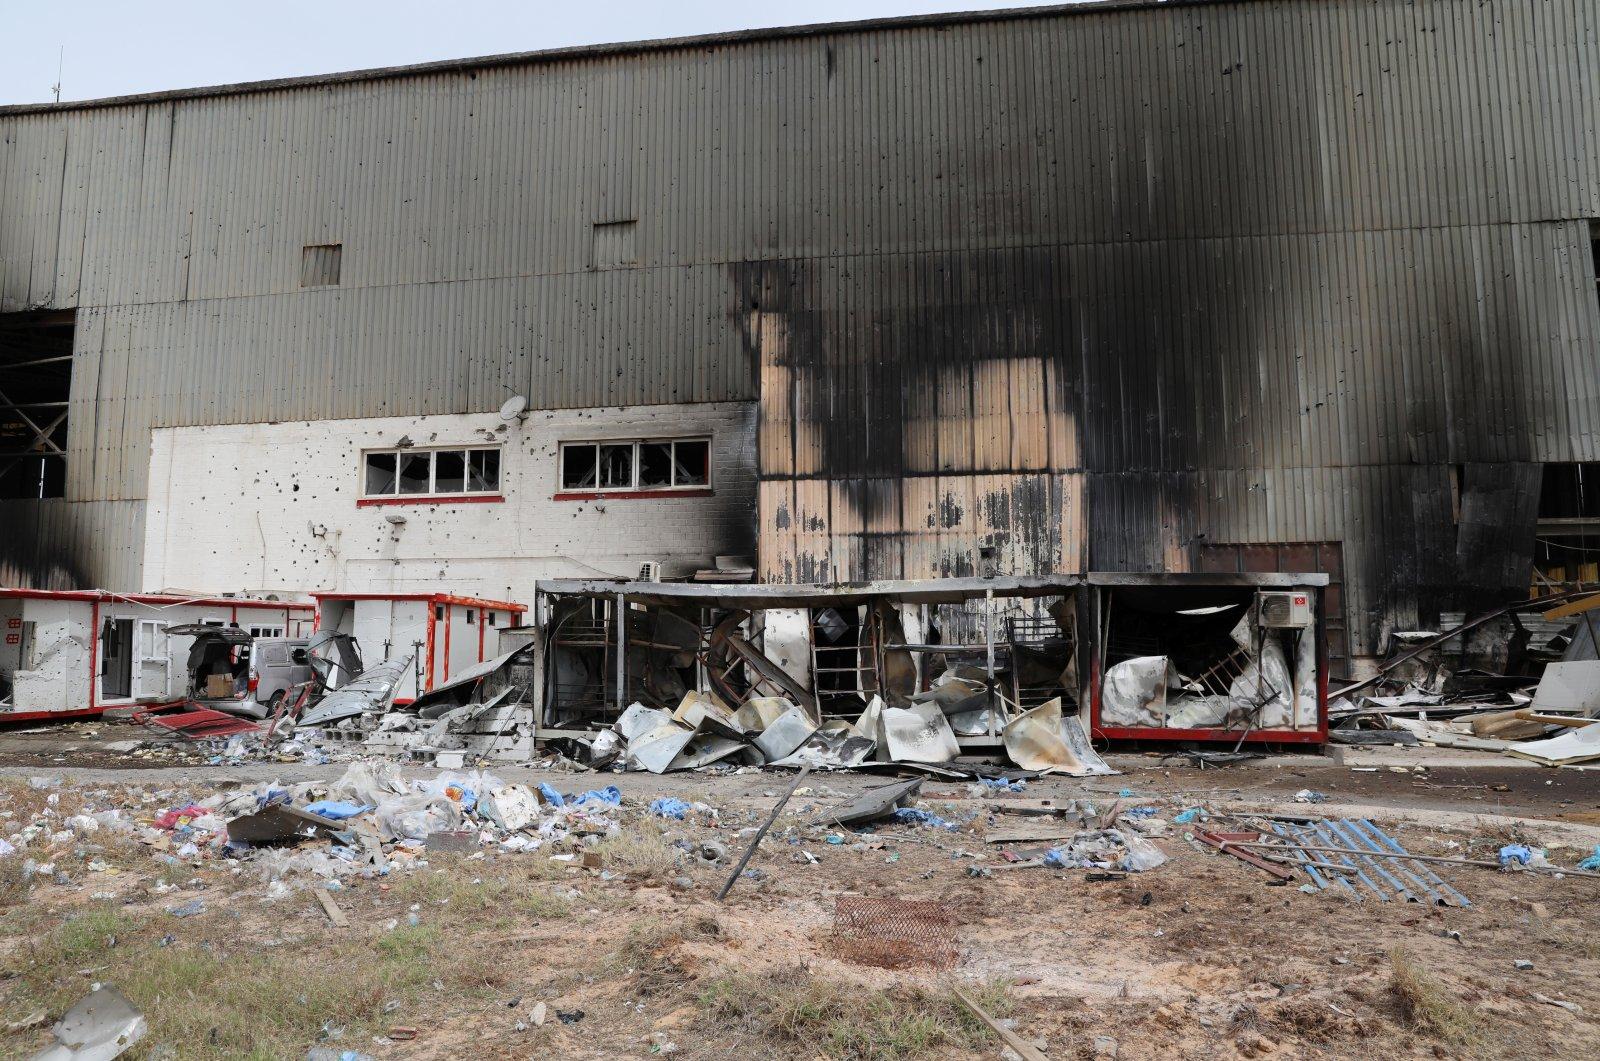 Damage is seen following shelling at Mitiga International Airport in Tripoli, Libya, May 10, 2020. (Reuters Photo)